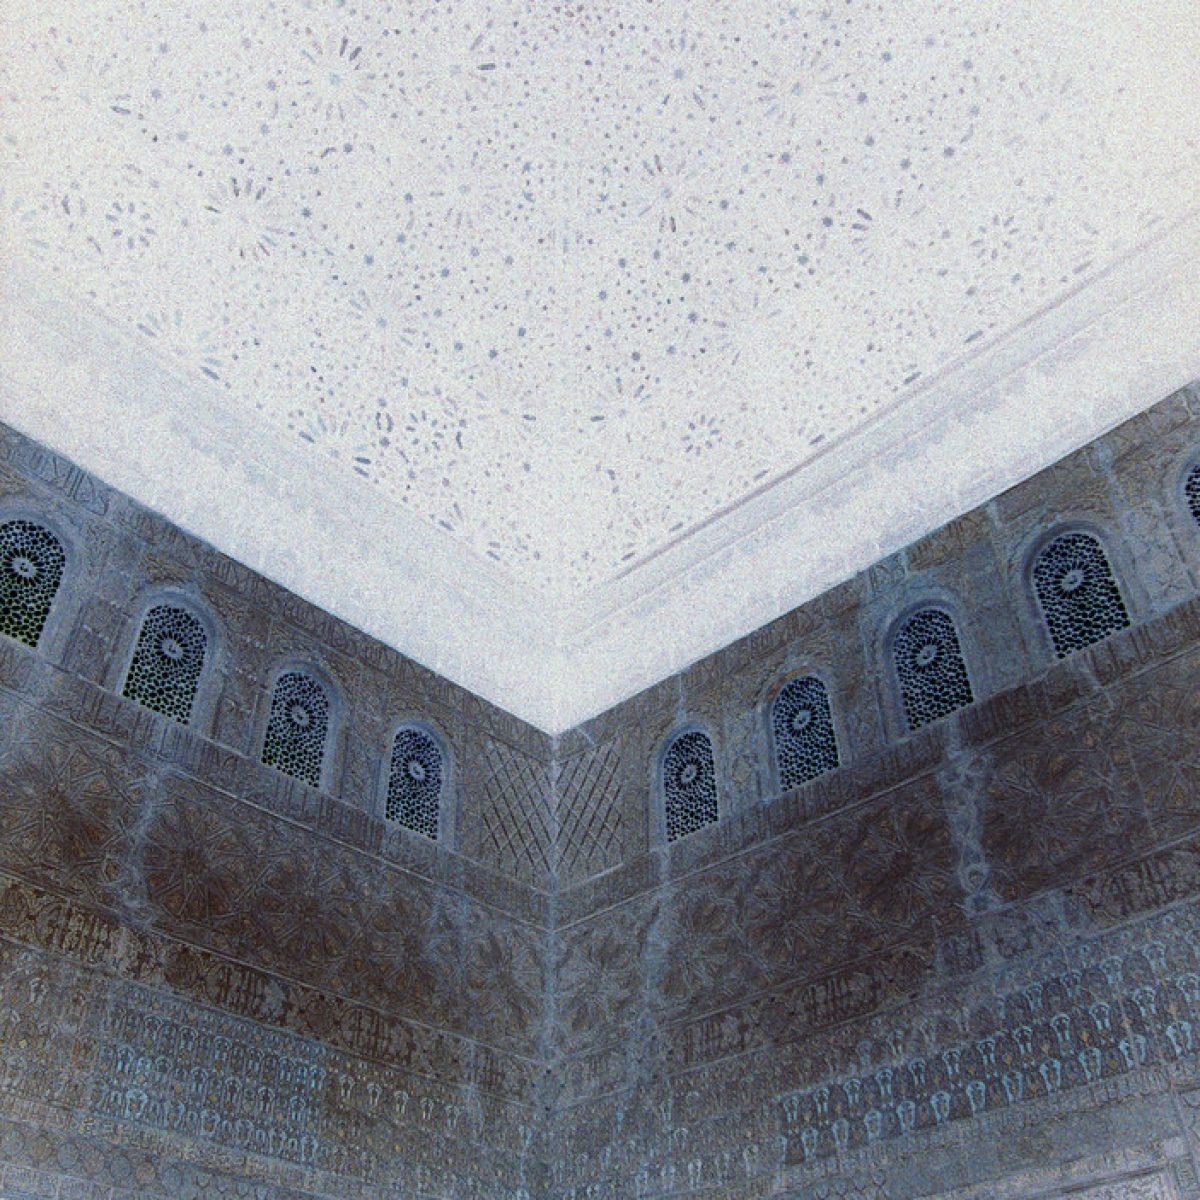 Akim Monet